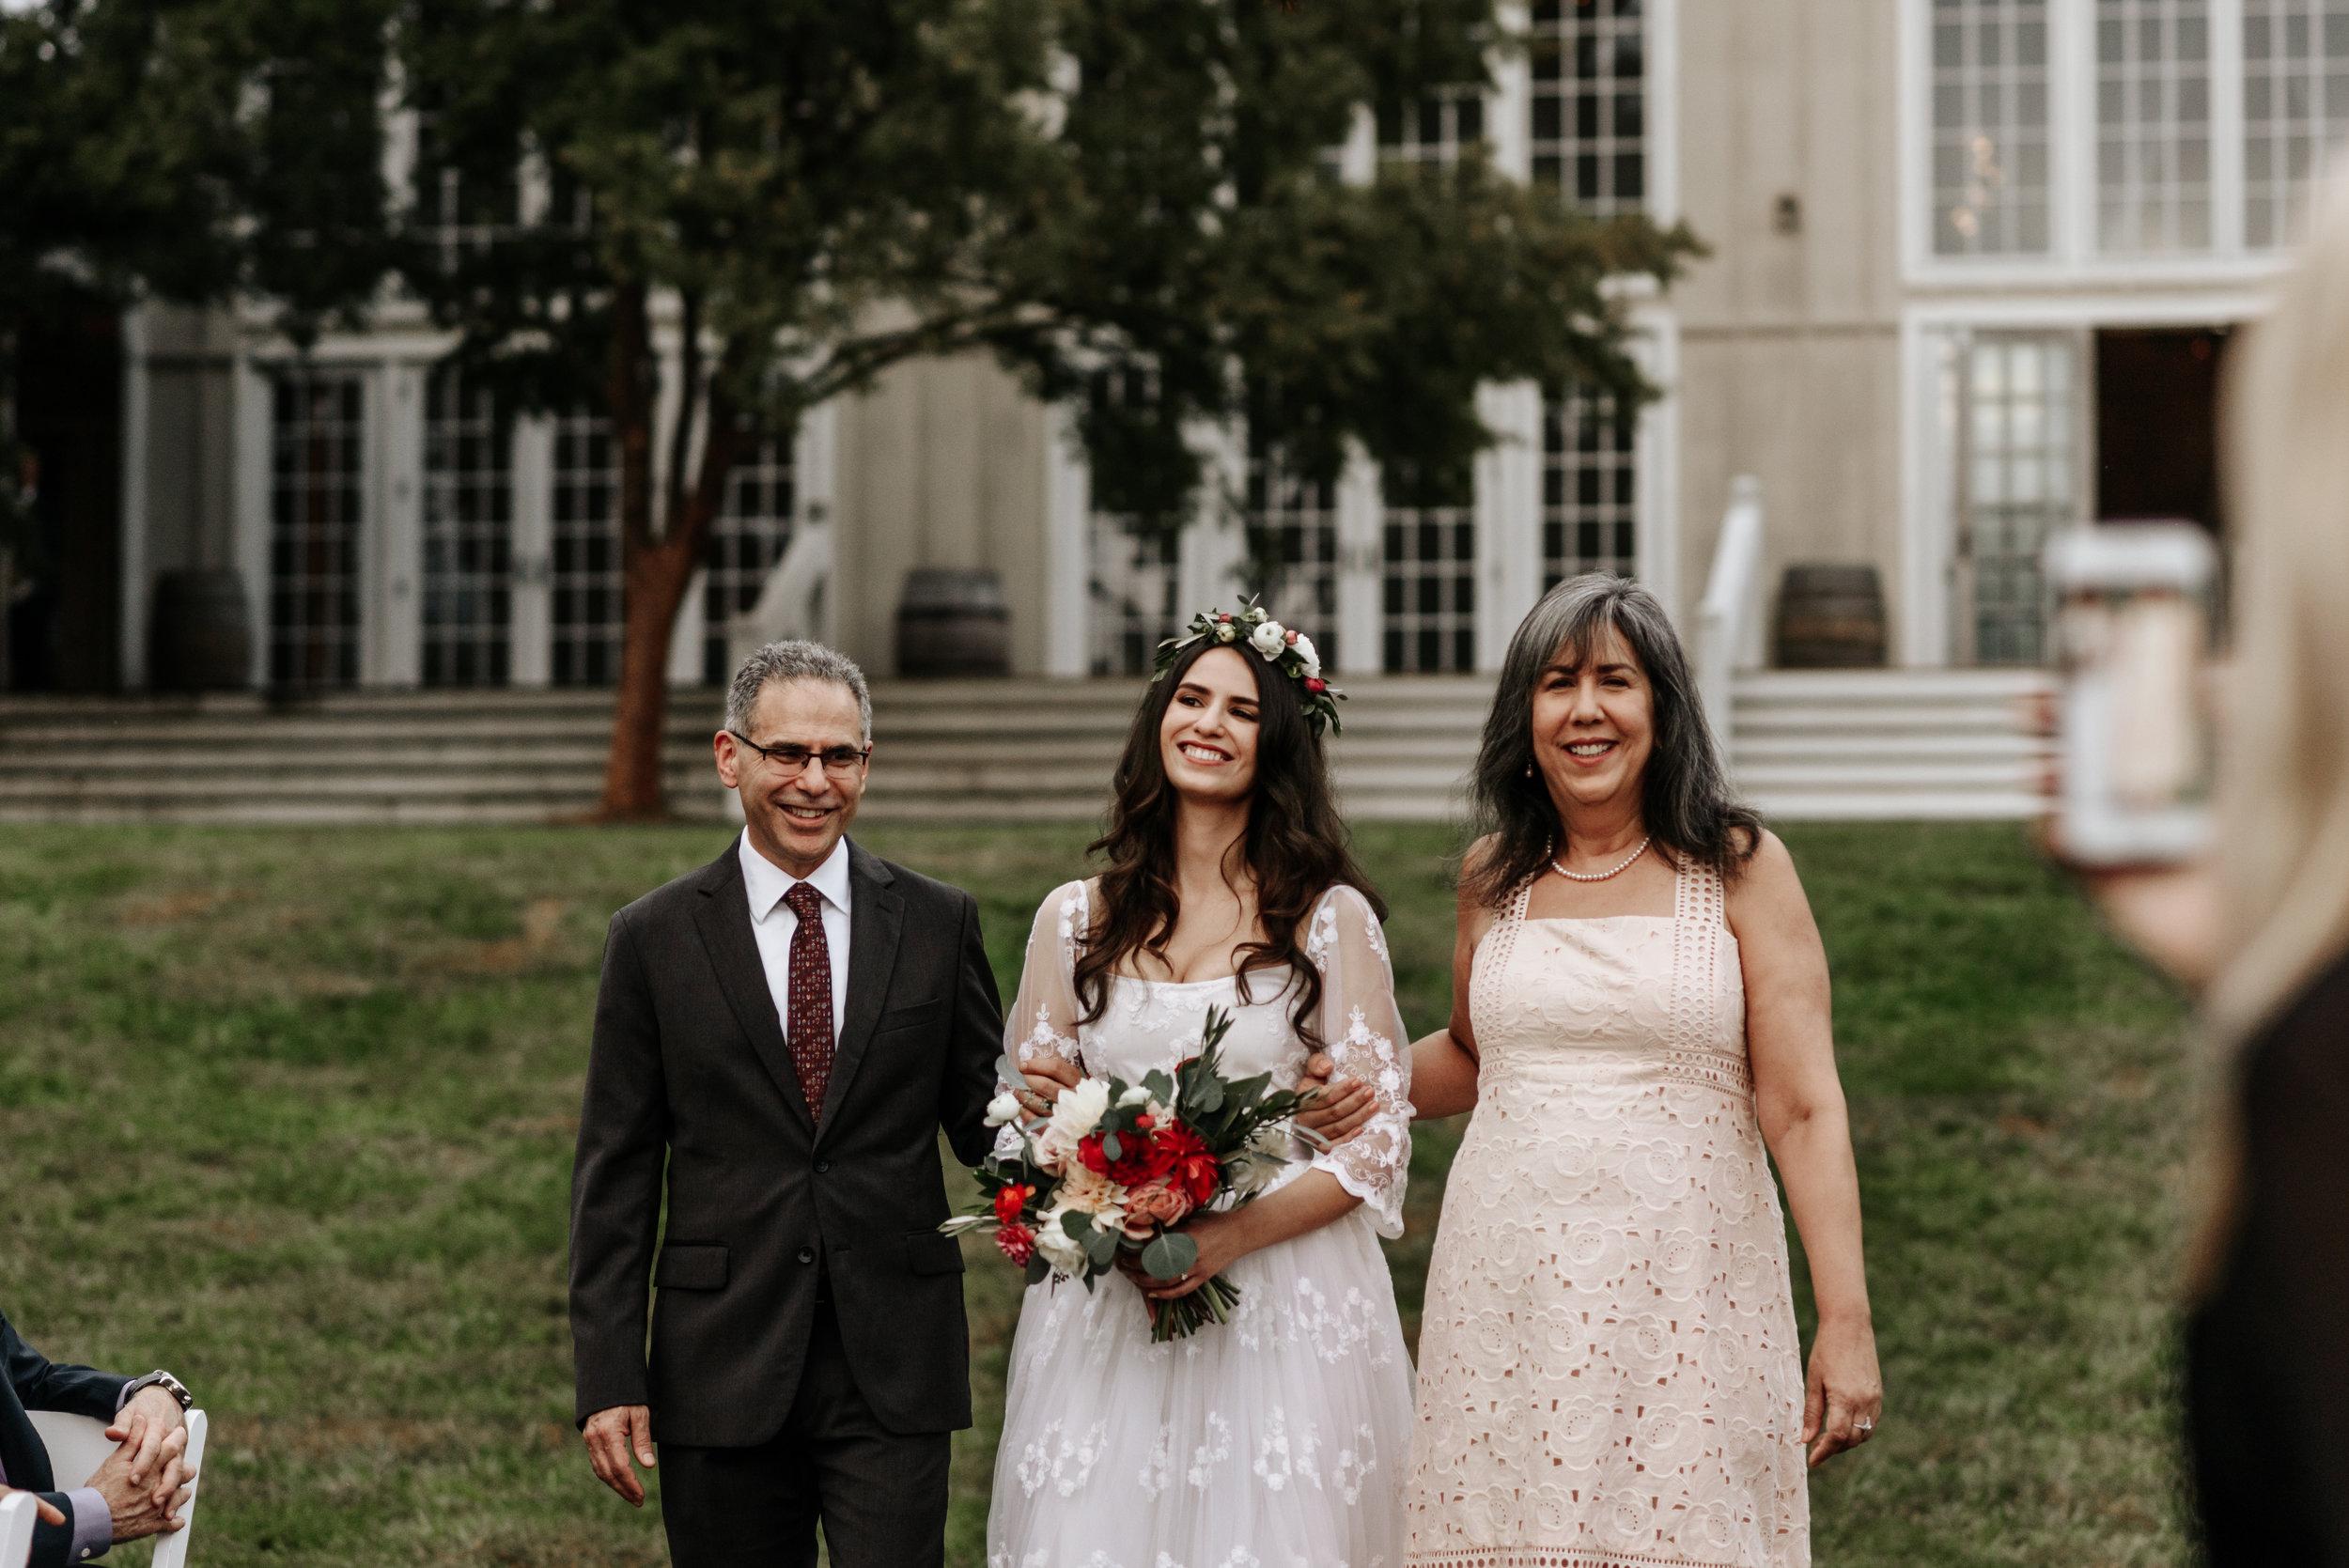 Veritas-Vineyards-and-Winery-Wedding-Photography-Afton-Virginia-Yasmin-Seth-Photography-by-V-2779.jpg